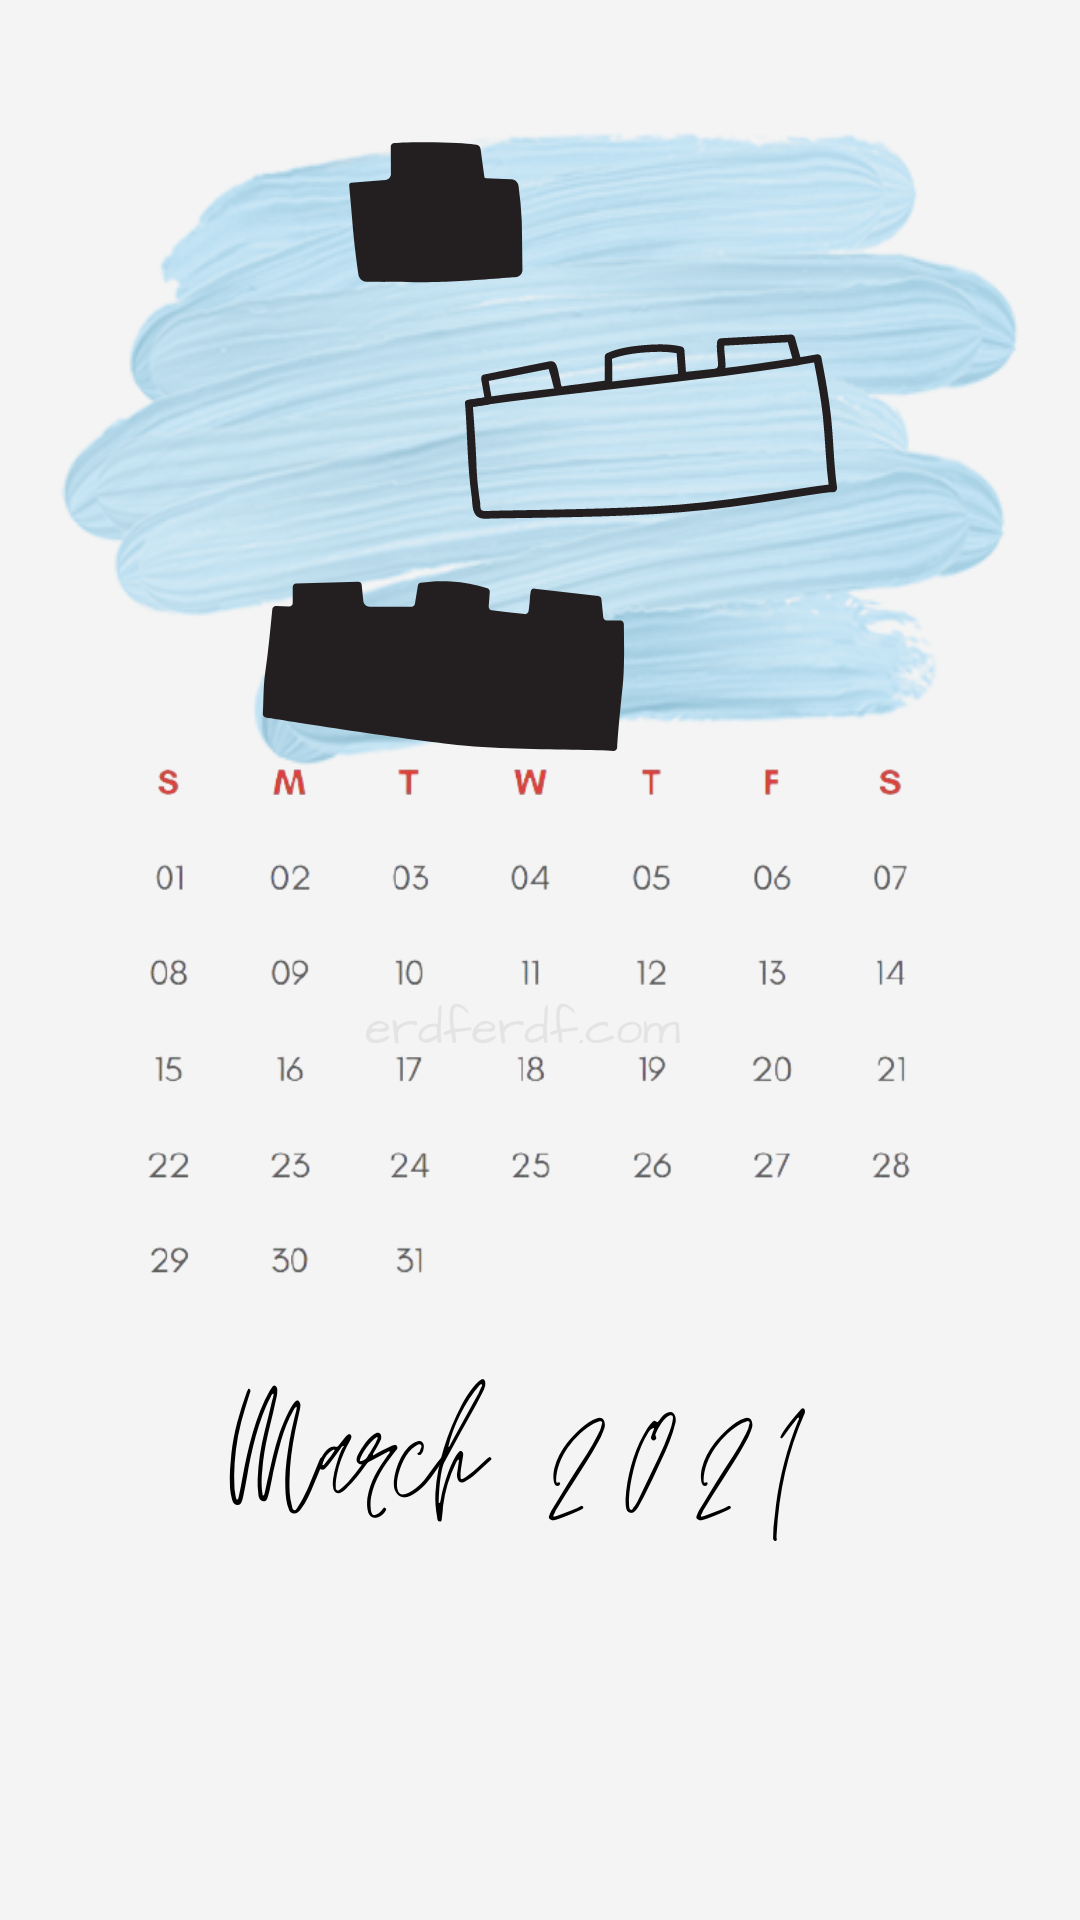 Iphone Wallpaper March 2021 Calendar Free White Lego